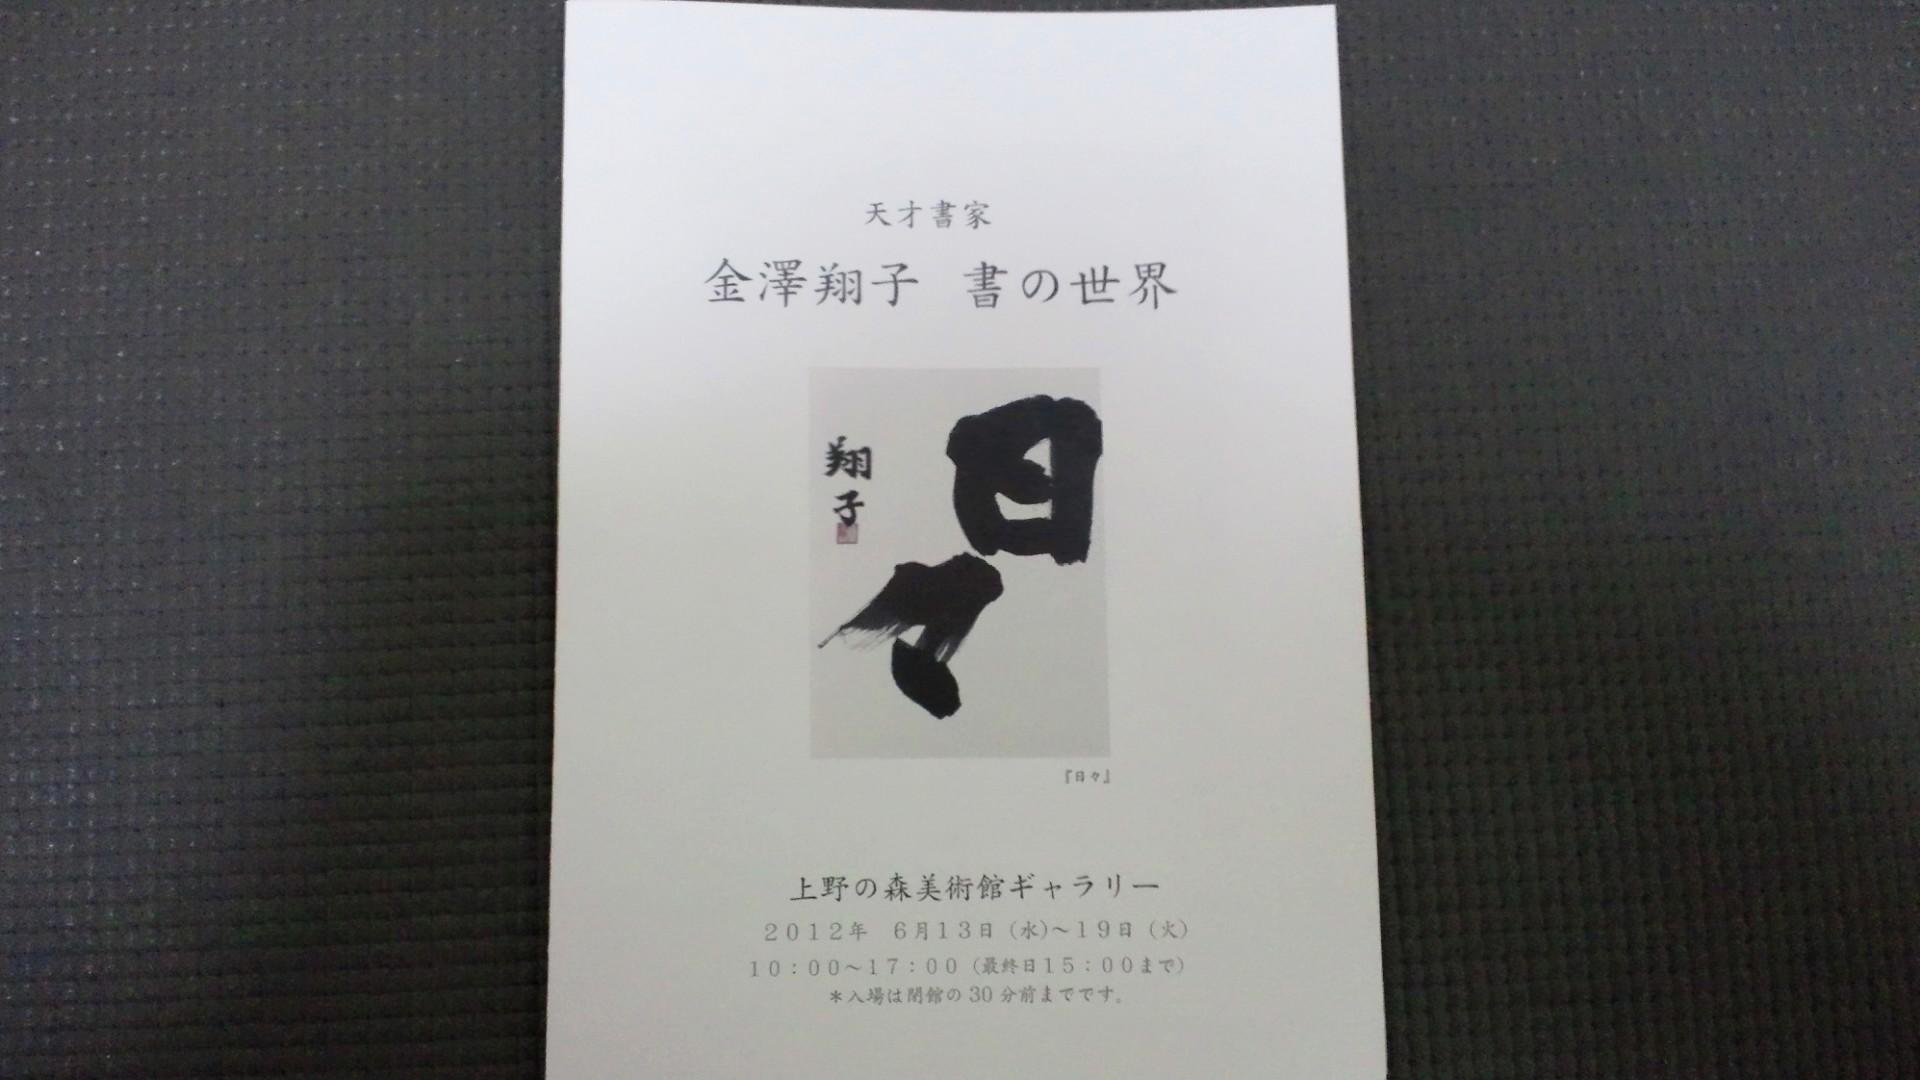 金澤翔子さん展示会。